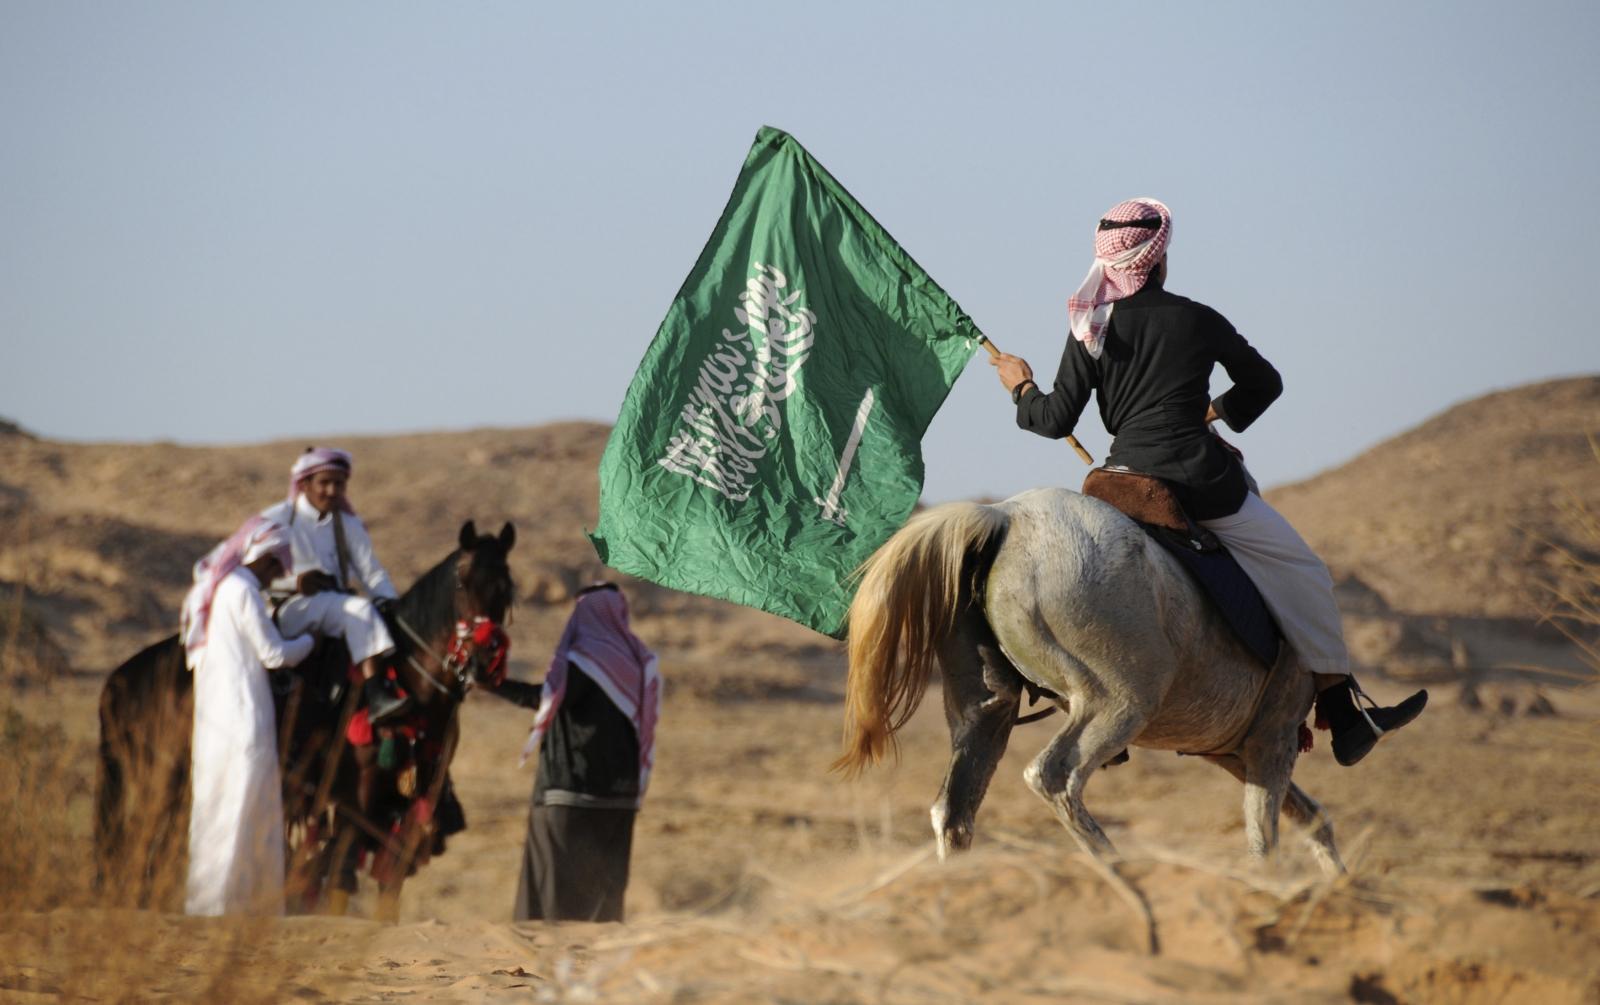 A Saudi man riding a horse waves a national flag